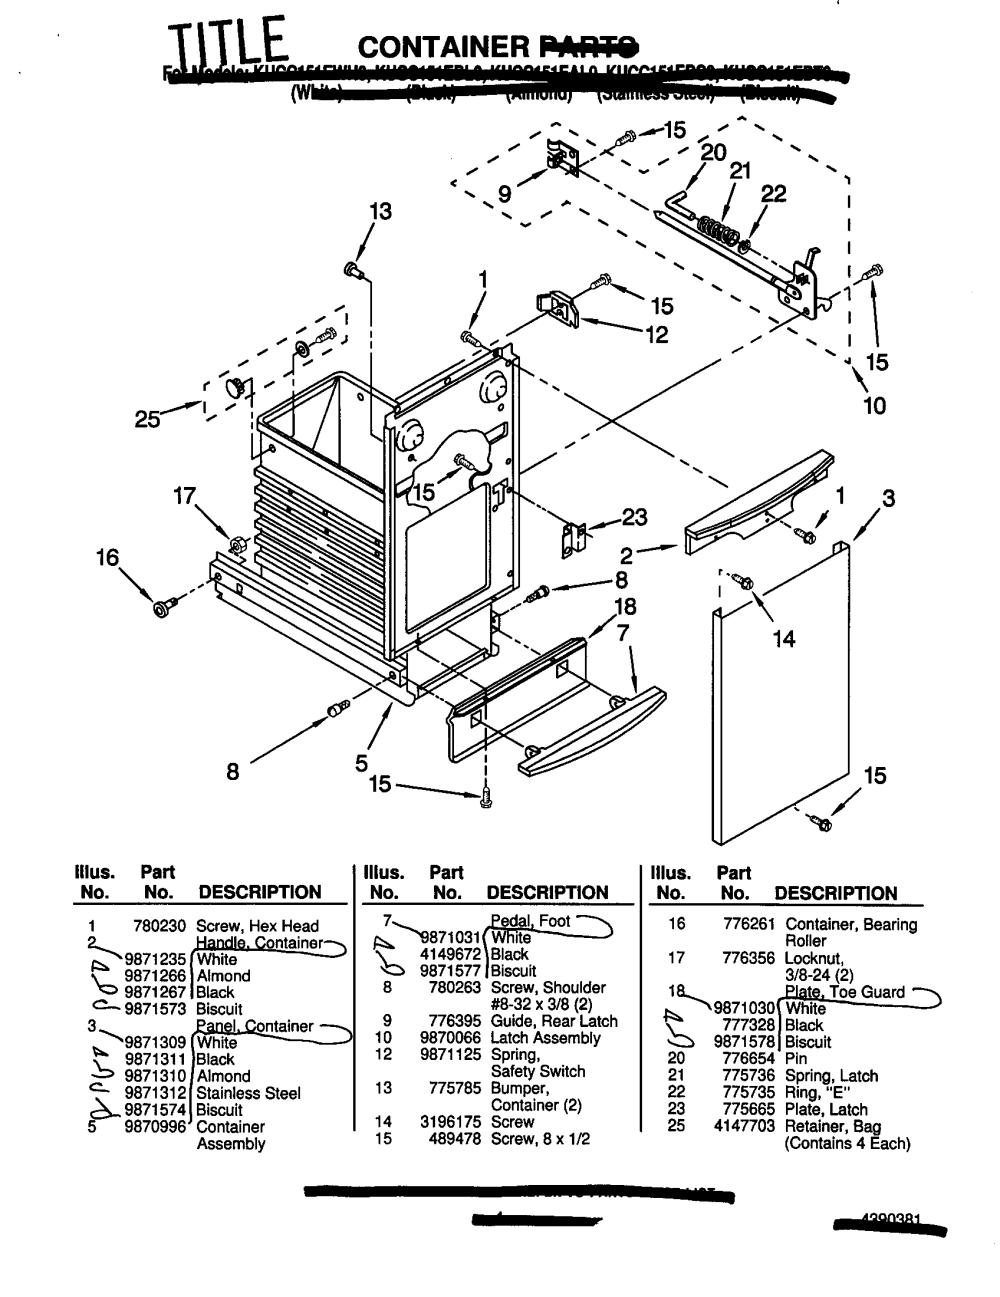 medium resolution of kitchenaid kucc151ebl0 container diagram